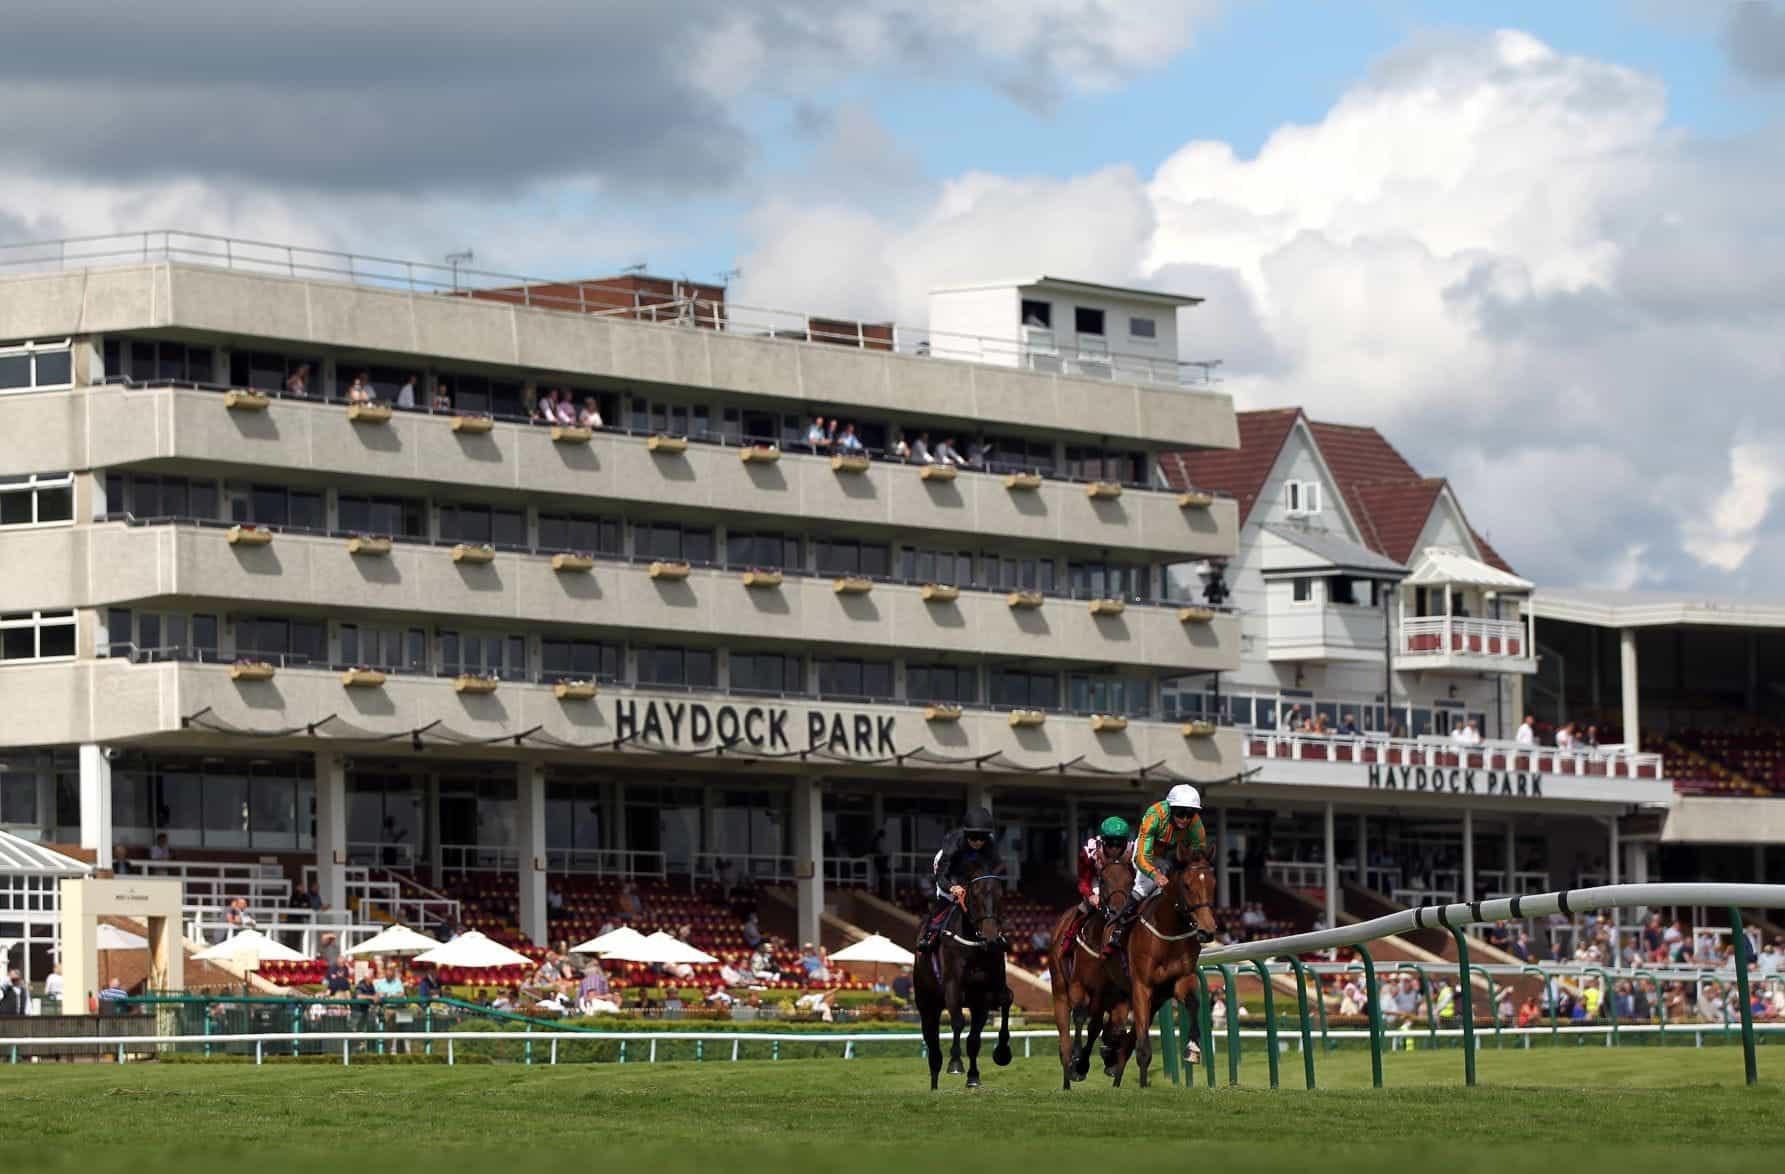 tribun Haydock Park selama hari perlombaan.